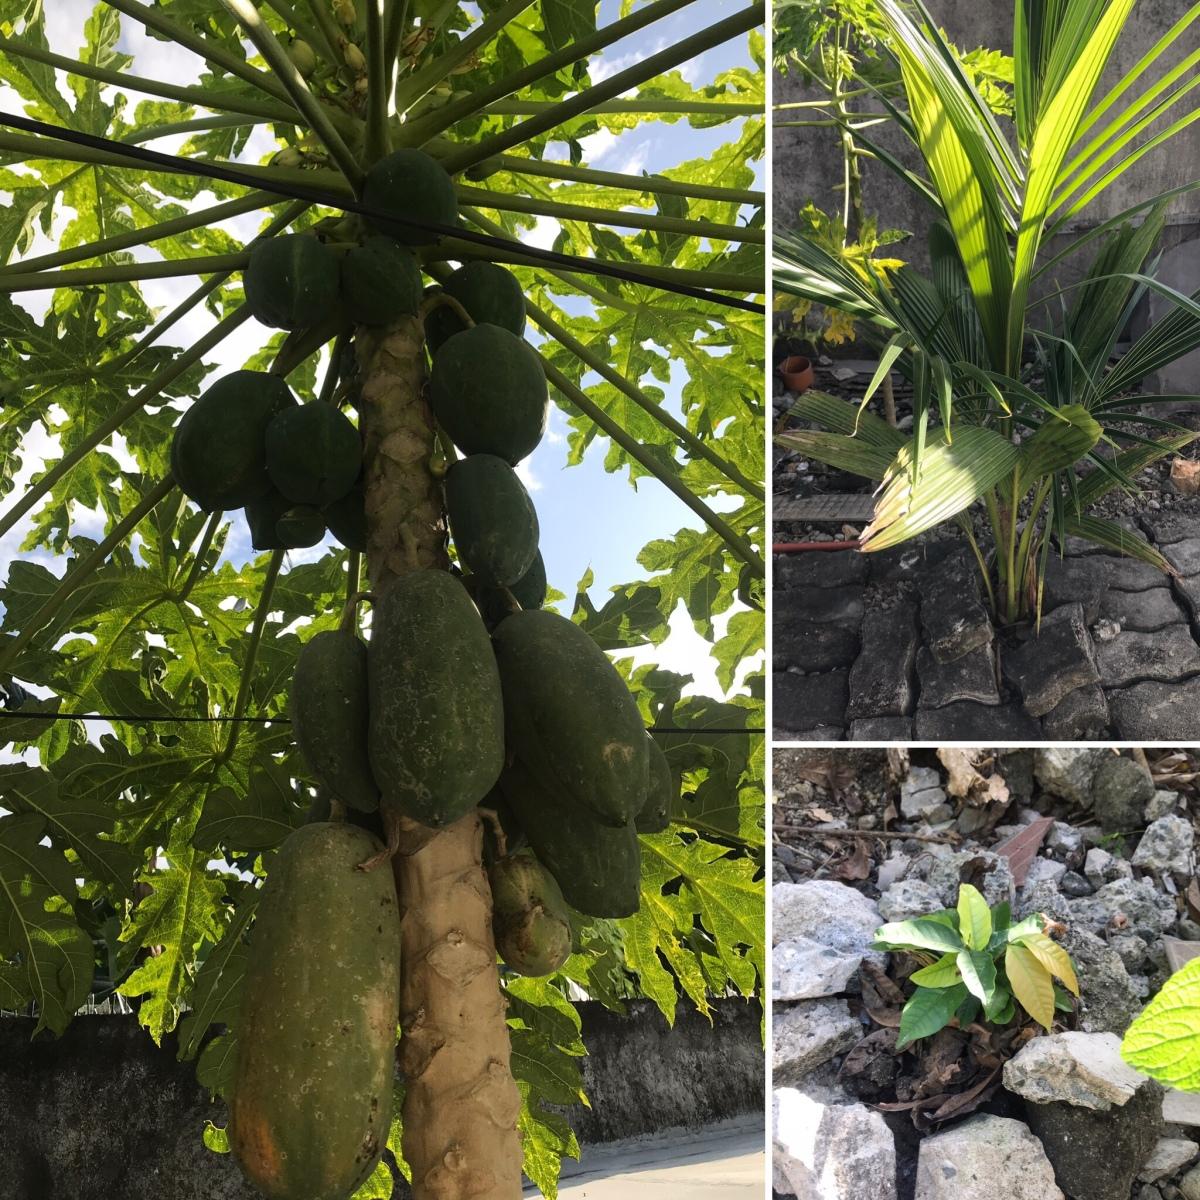 Organic fruits bearing trees